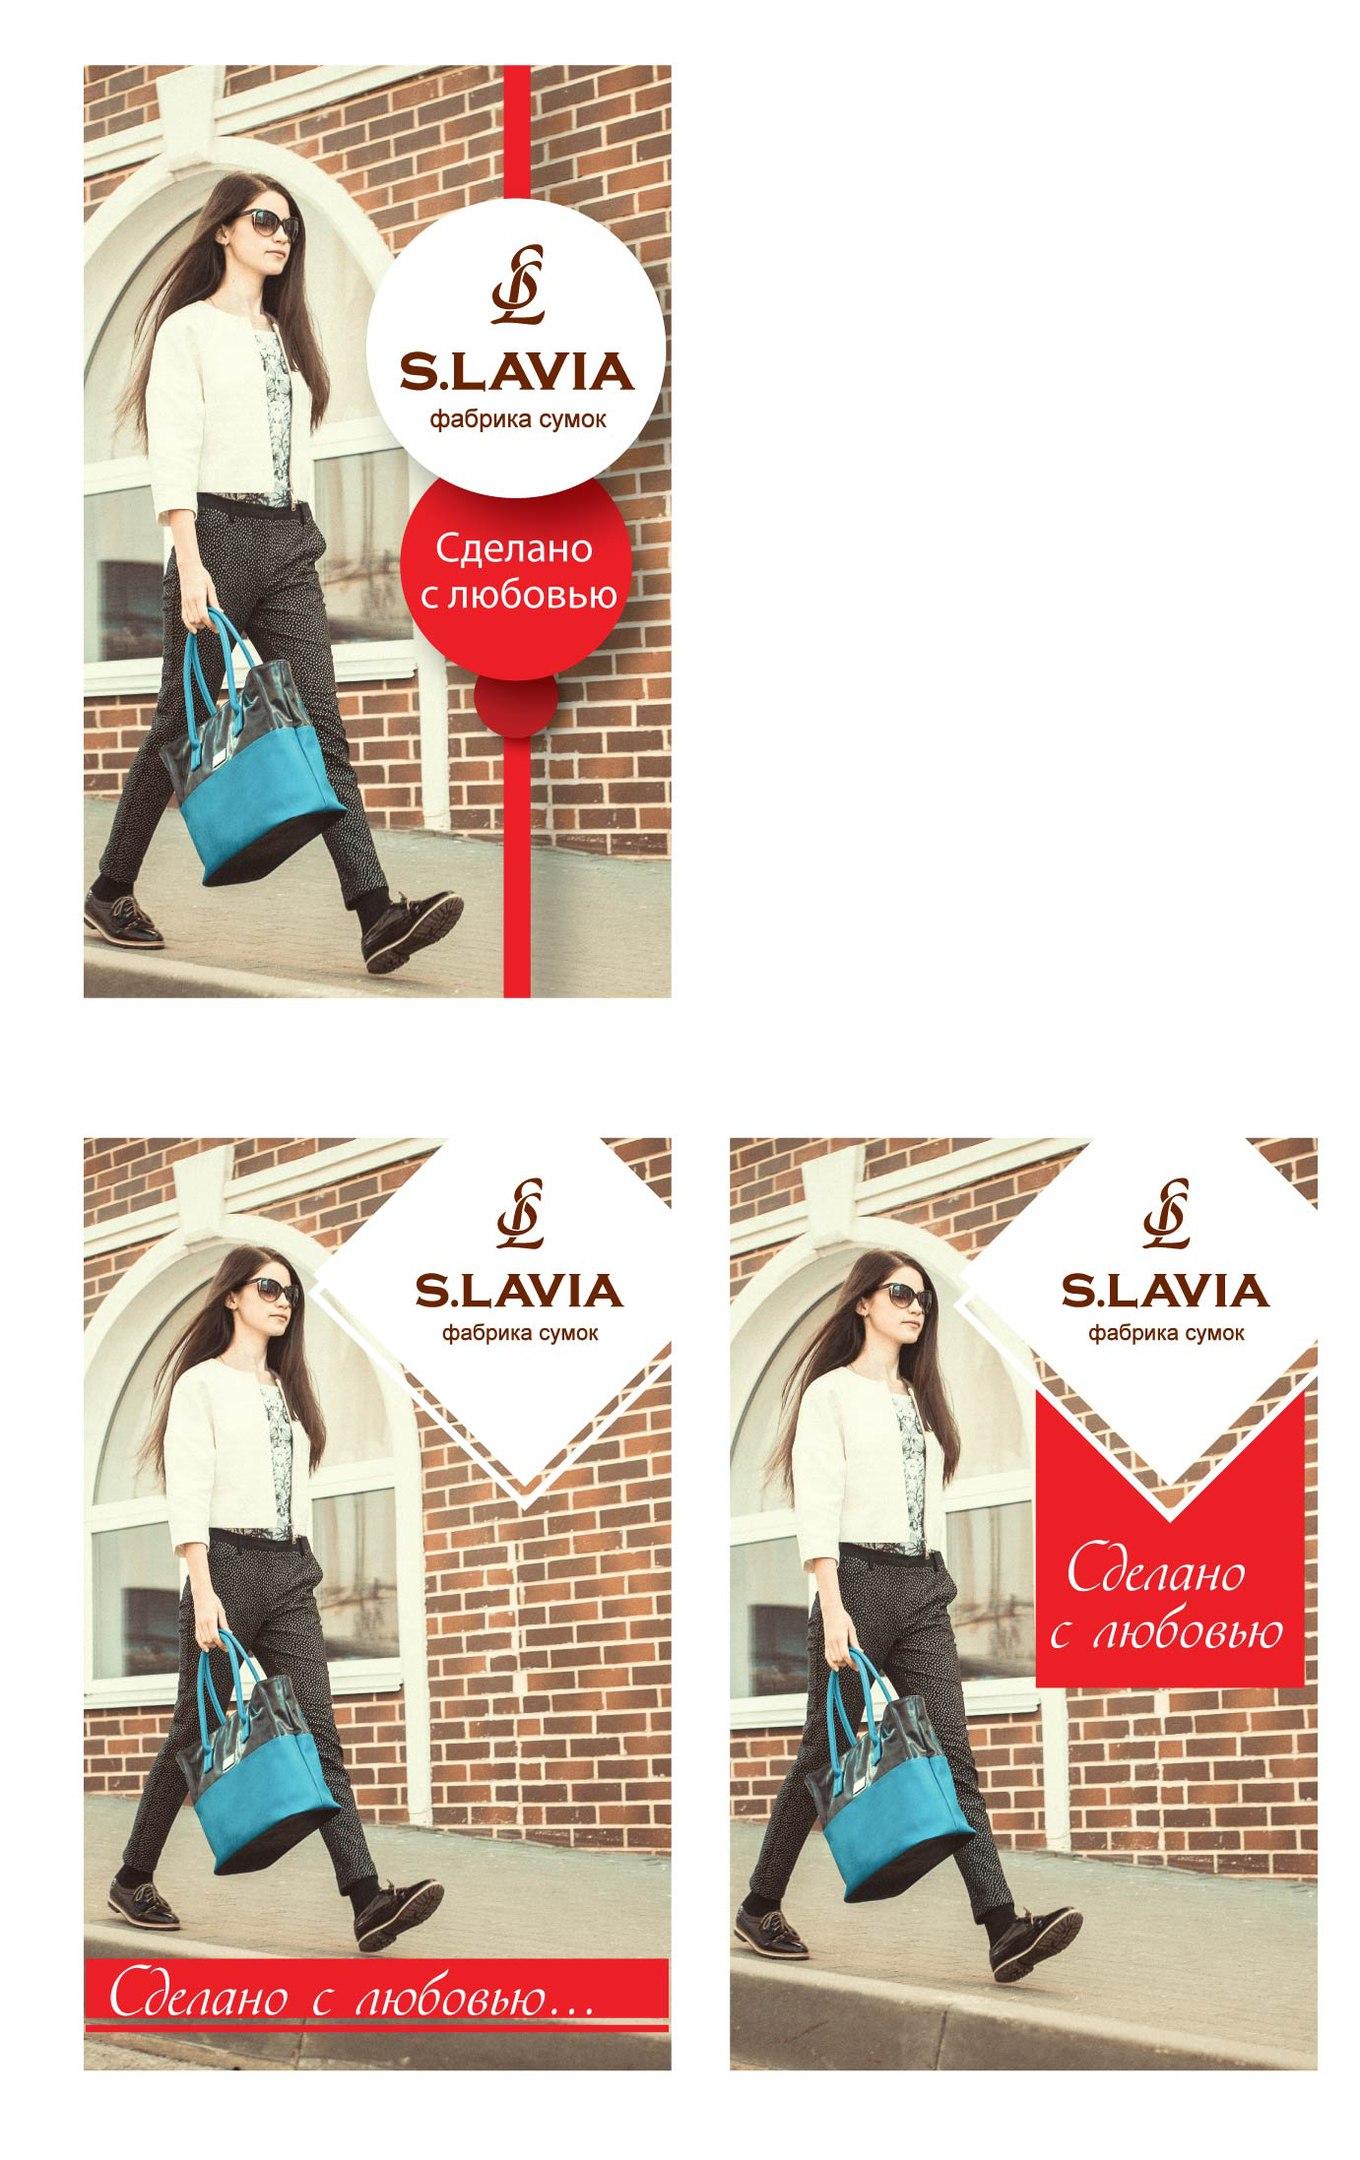 Баннеры Slavia